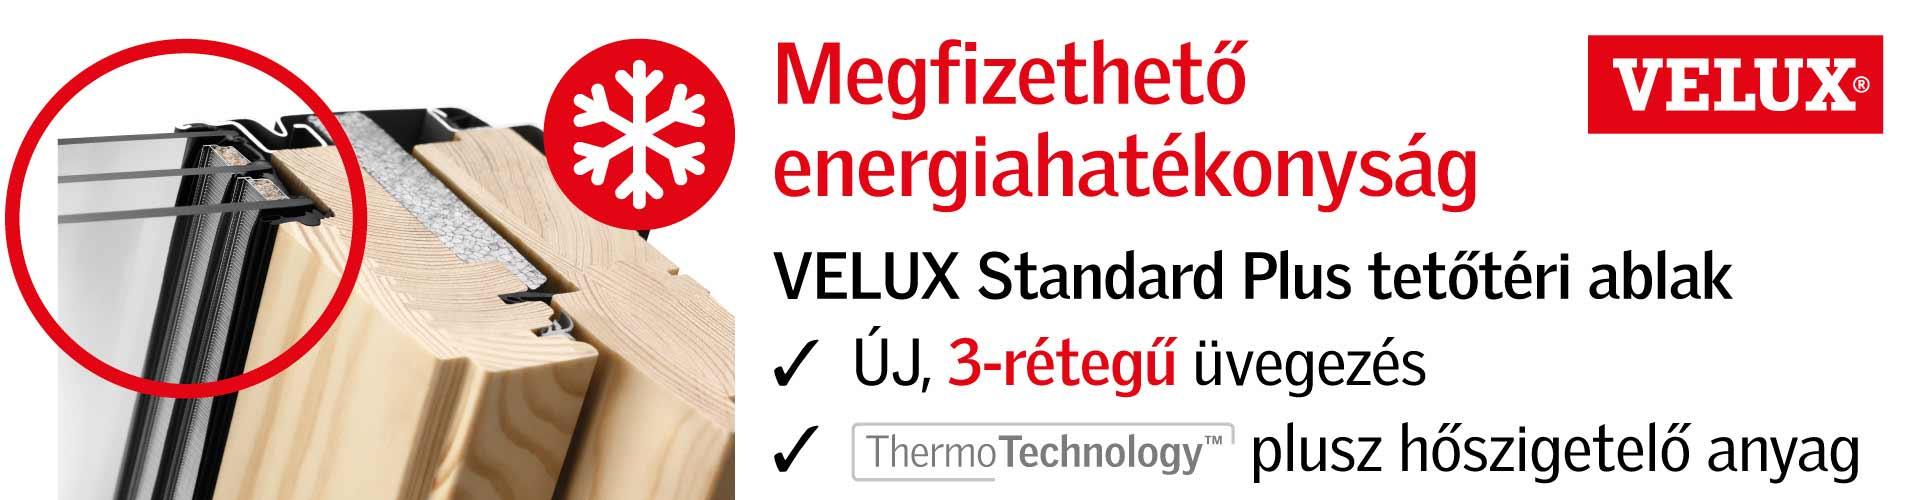 Velux webshop